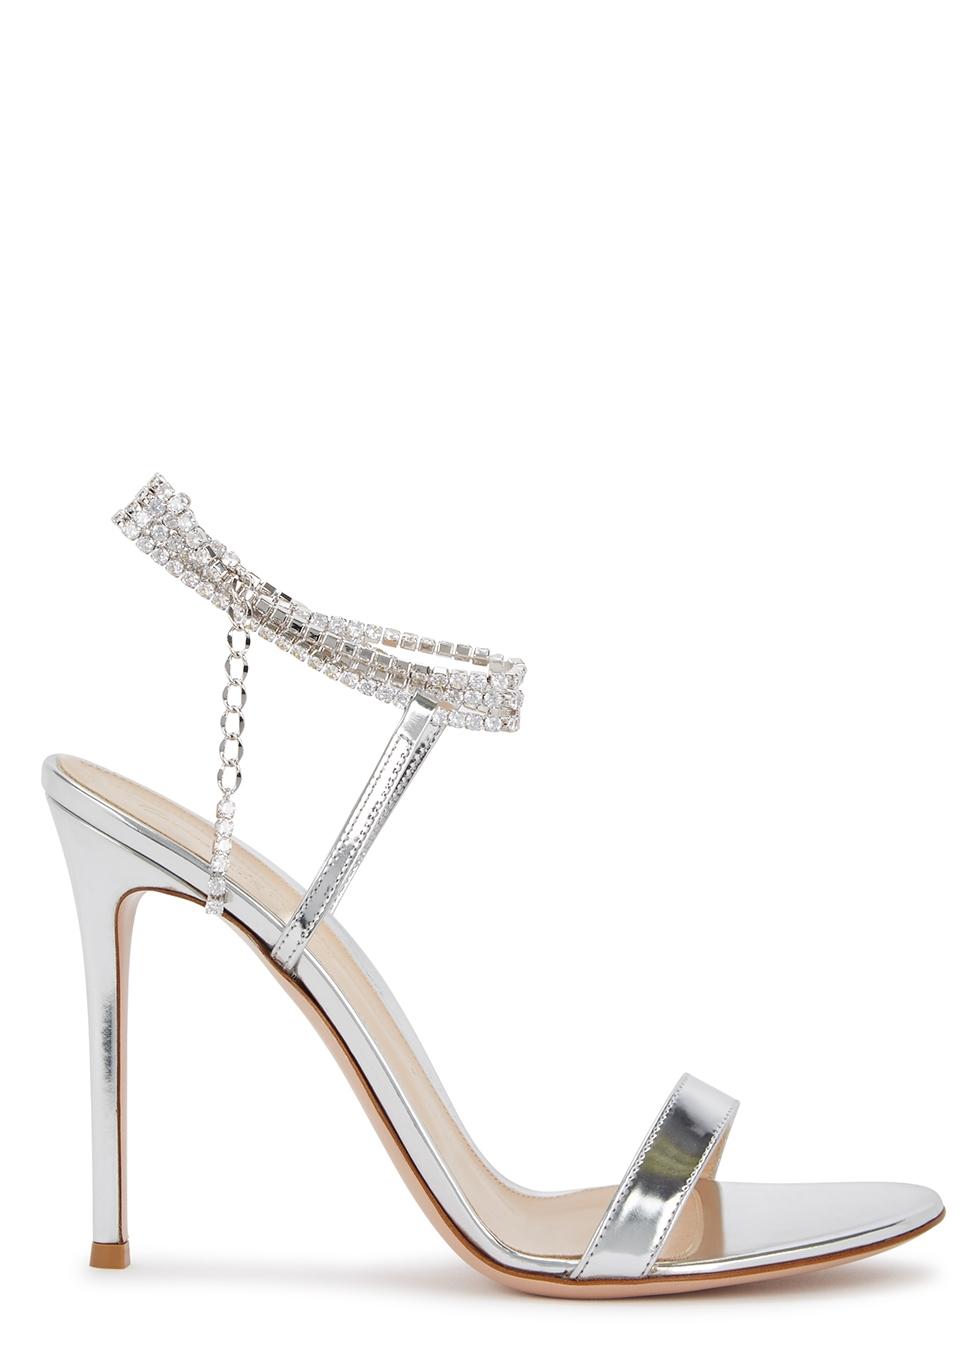 4392cb58b6d2 Women s Designer High-Heel Sandals - Harvey Nichols